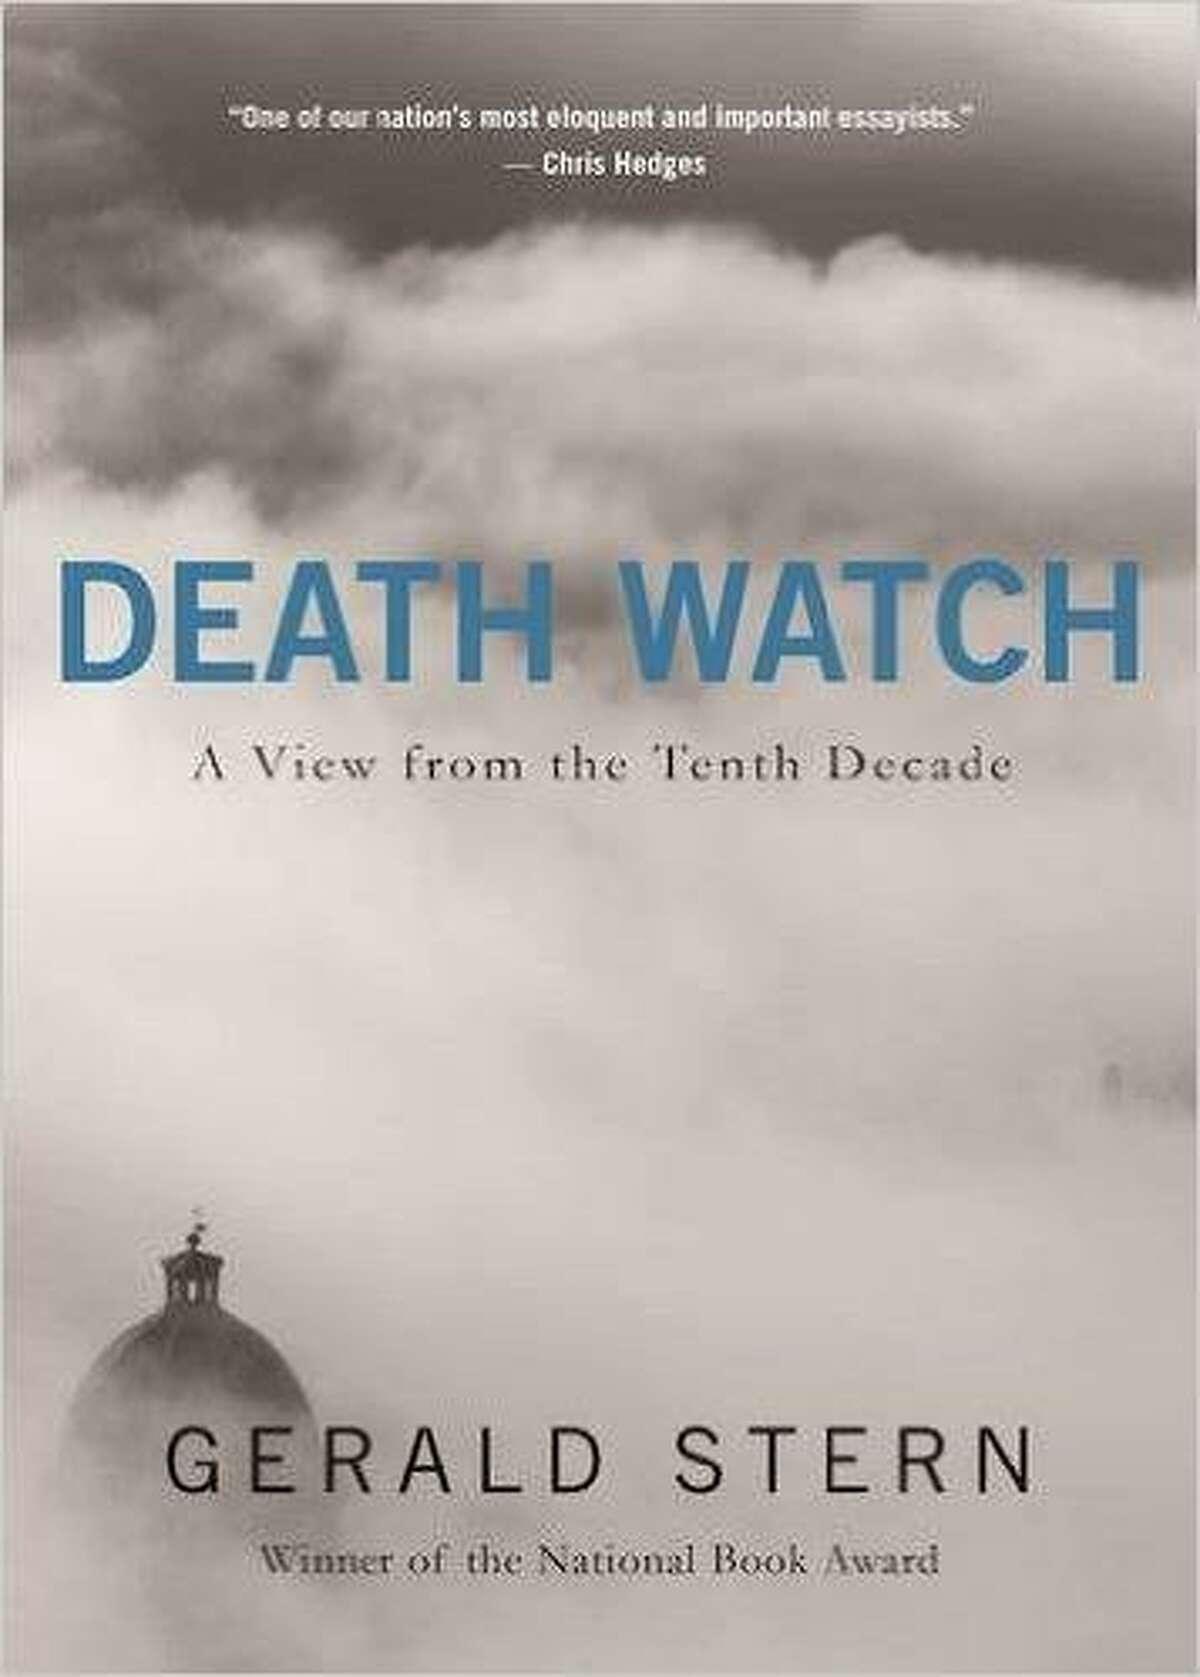 Gerald Stern's latest book